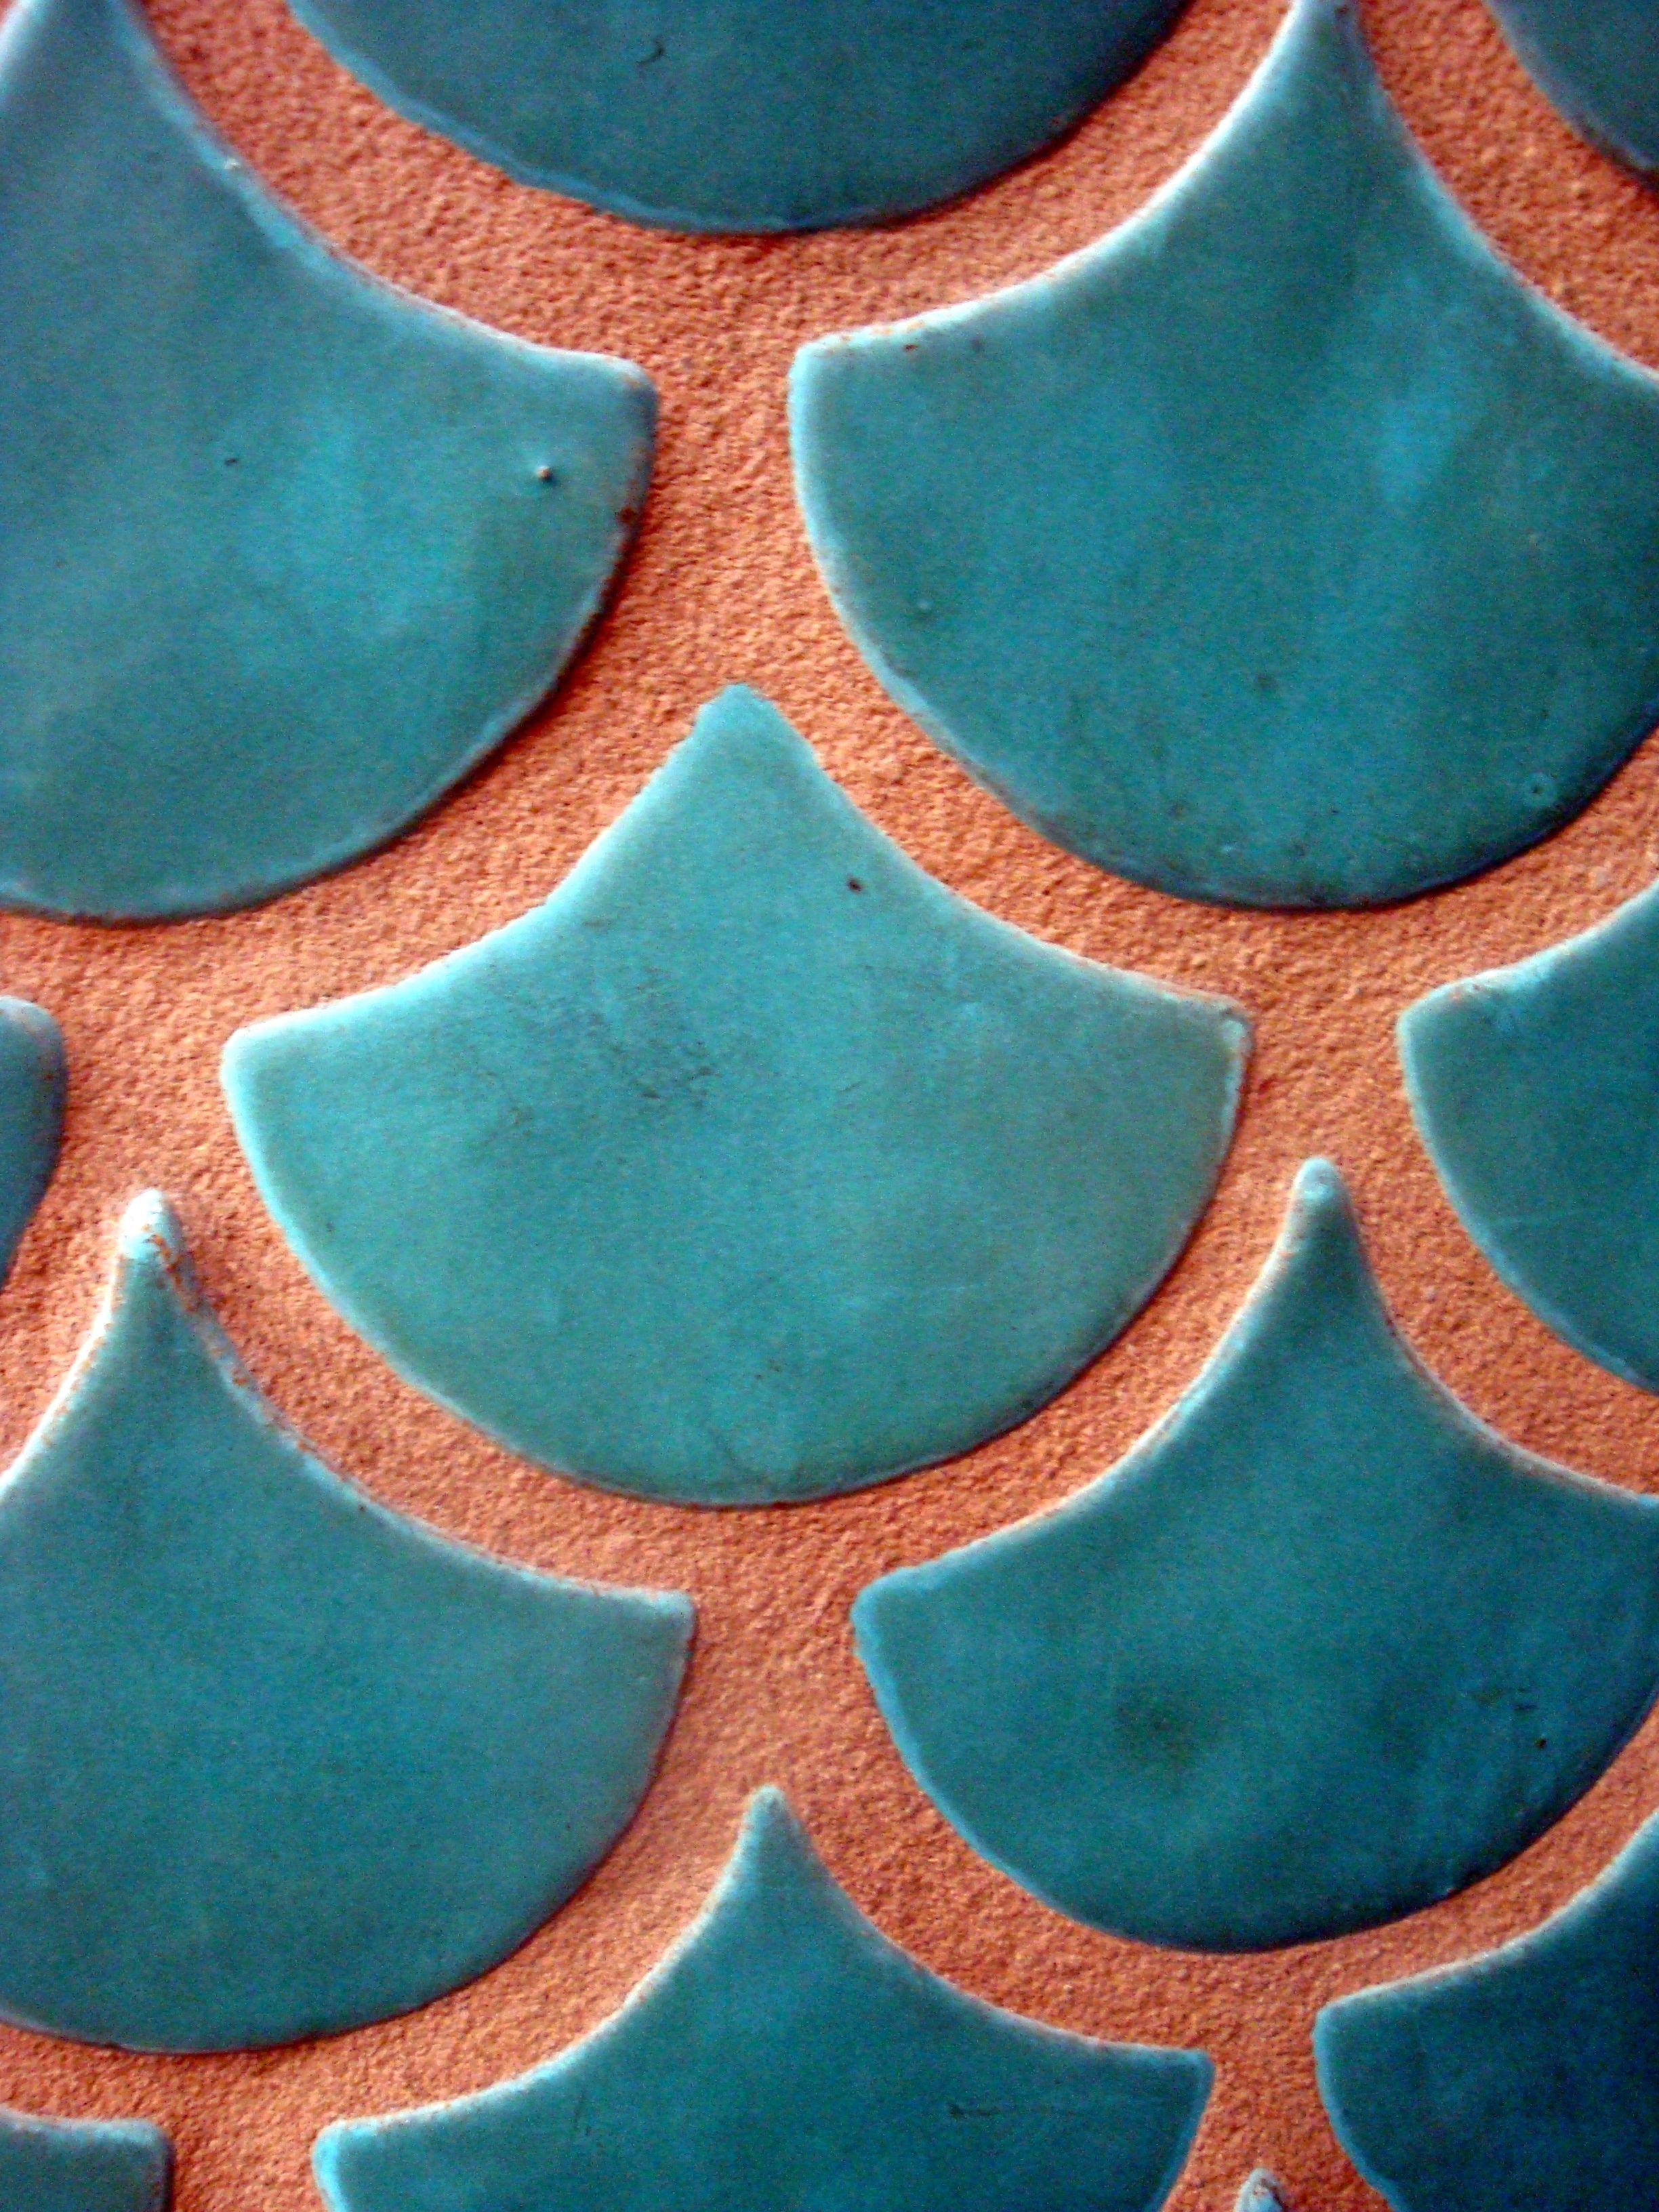 Gingko Leaf Tile Architecture Interiors Turquoise Tile